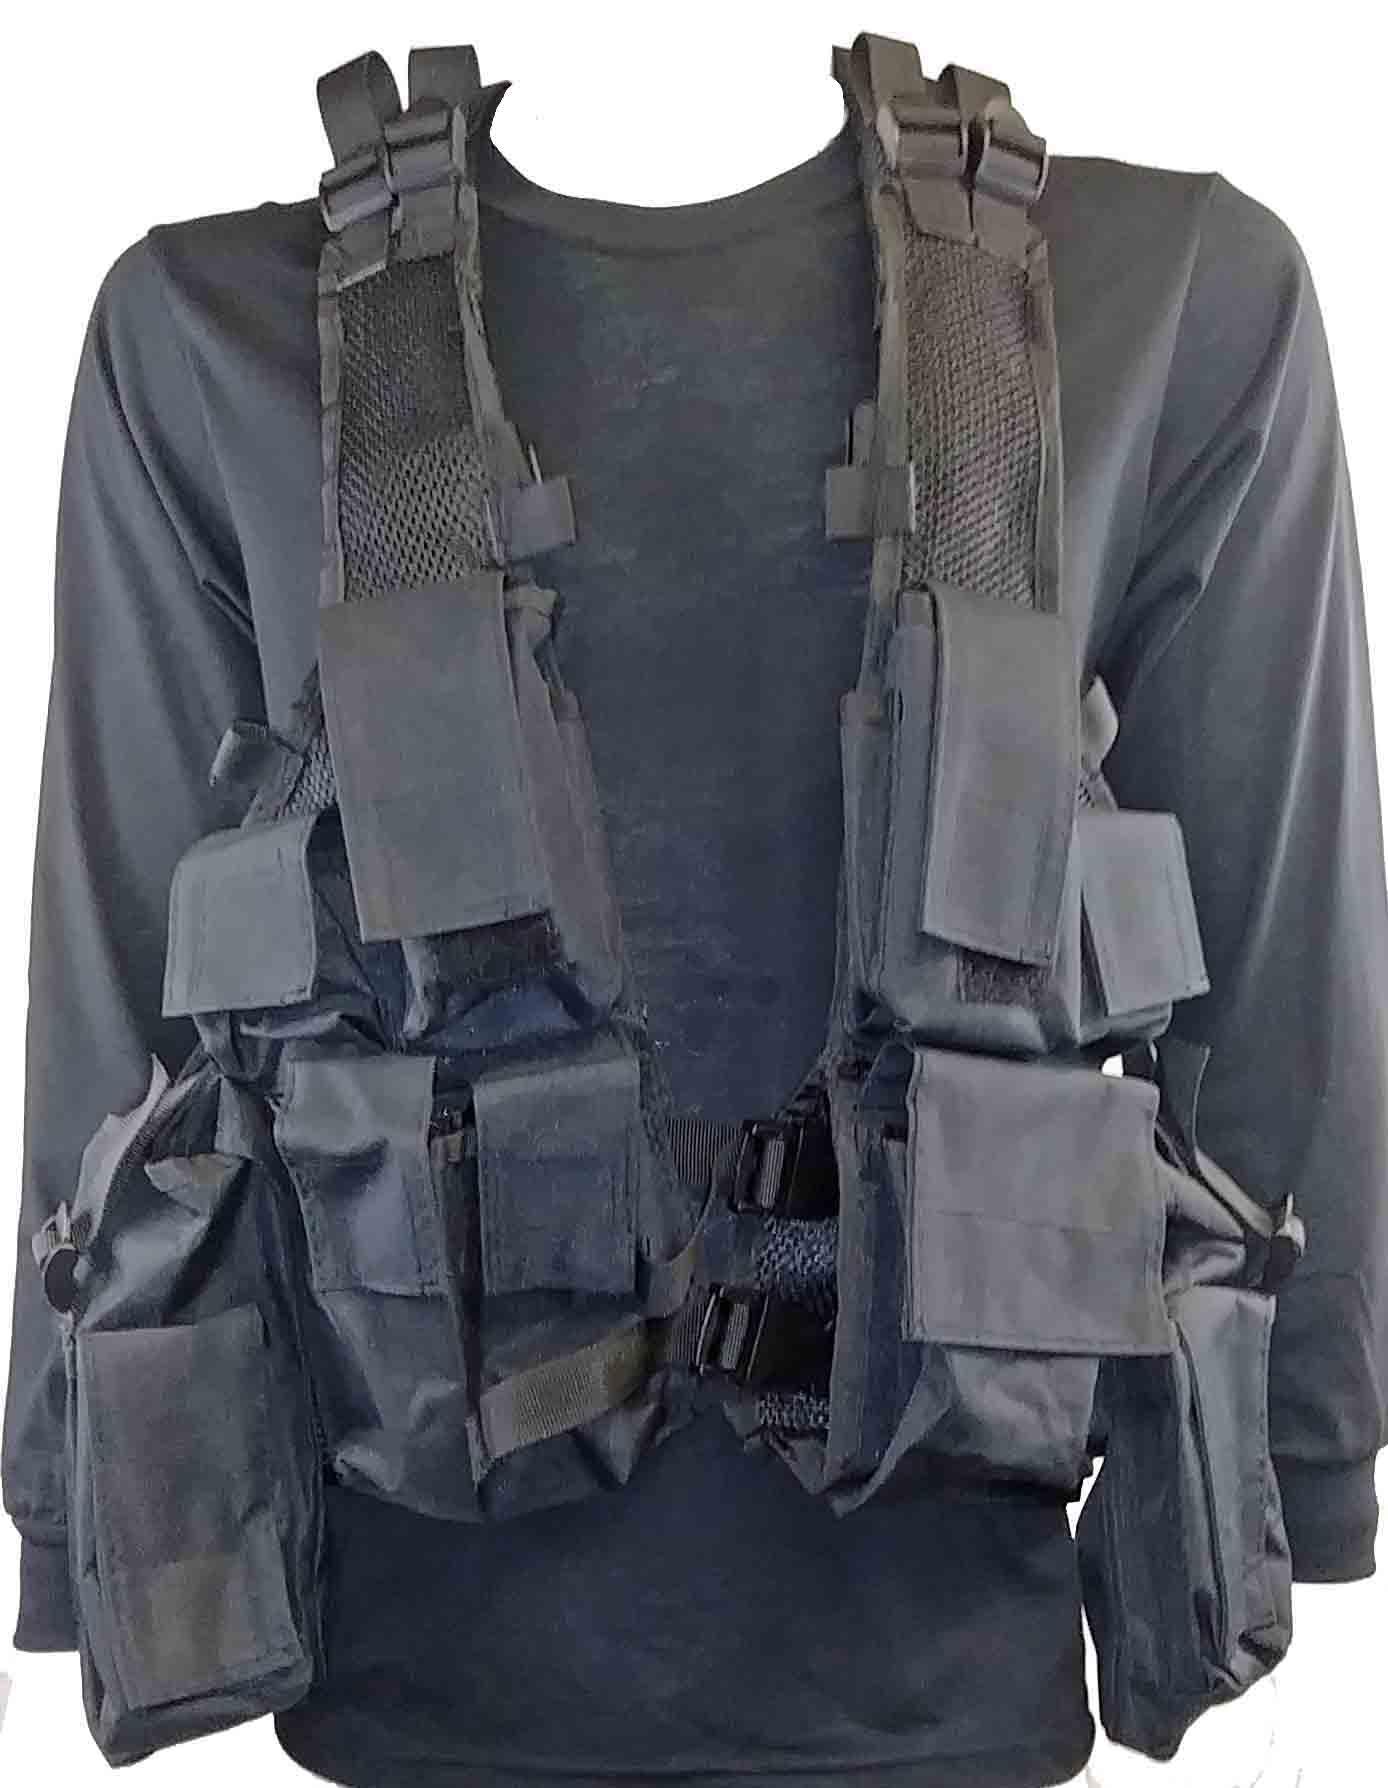 Black tactical vest